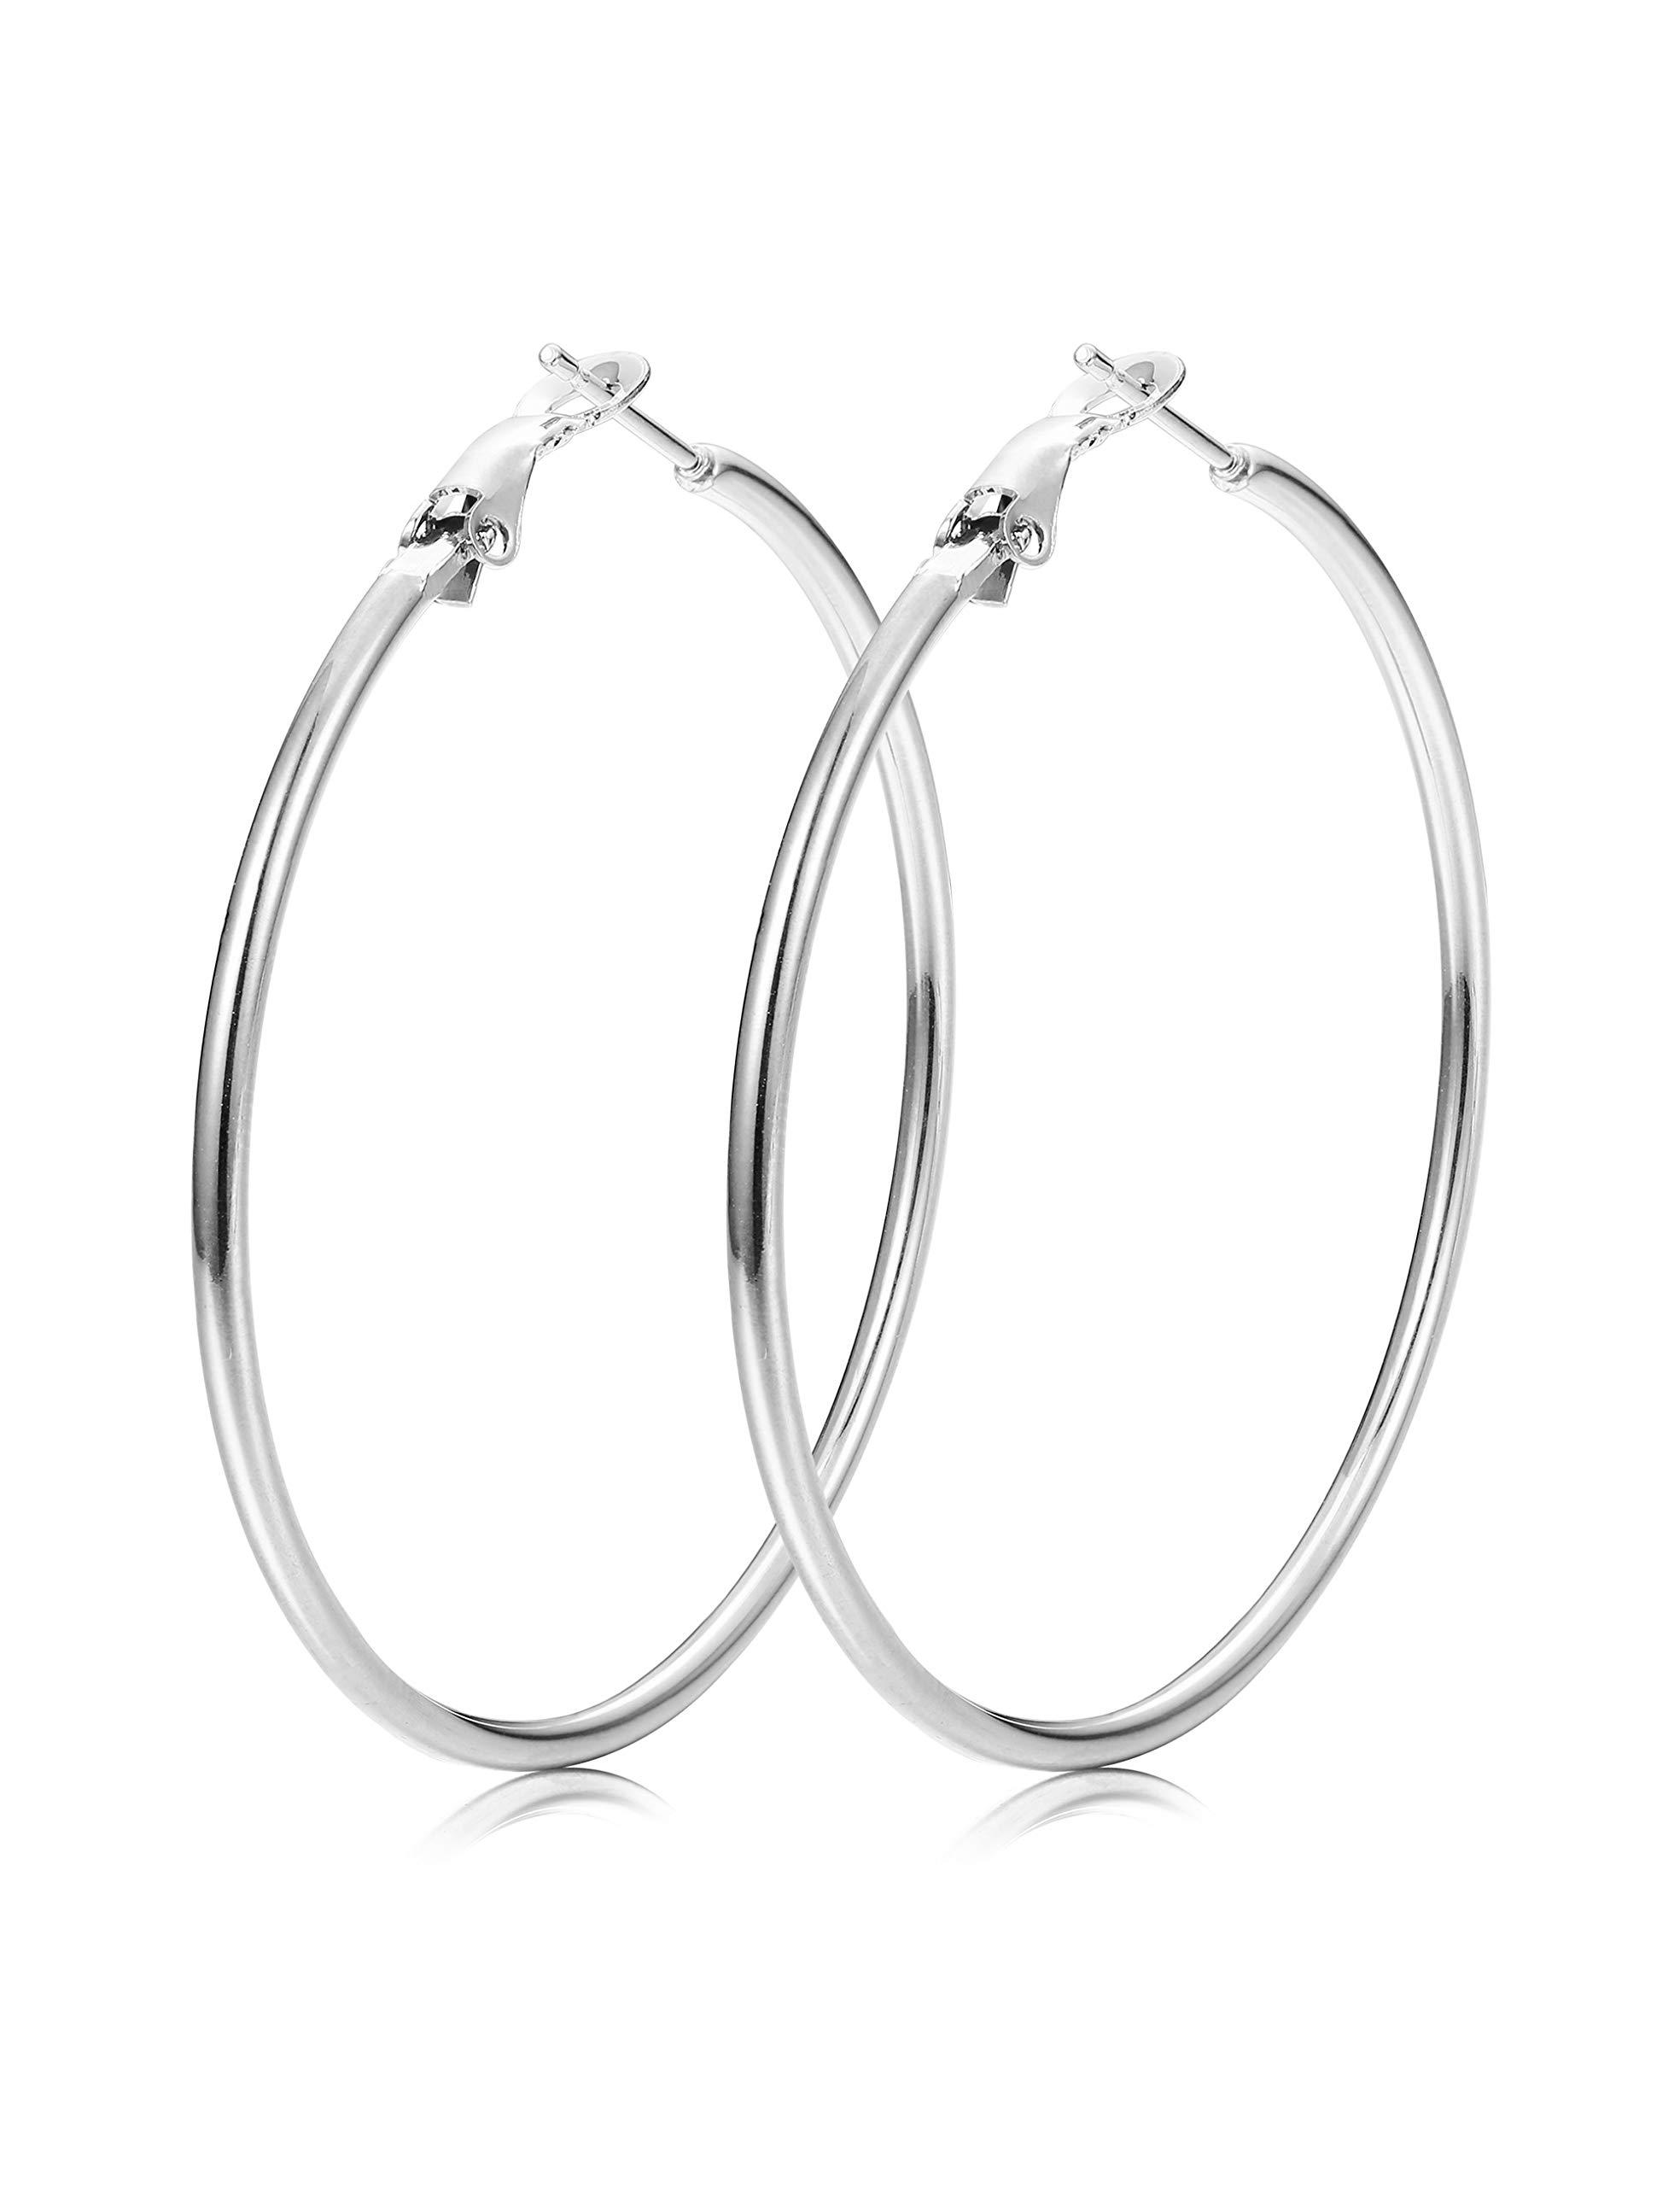 ORAZIO Hoop Earrings for Women Girls Stainless Steel Hoop Earrings in Gold Plated Rose Gold Plated Silver Black 30MM-80MM